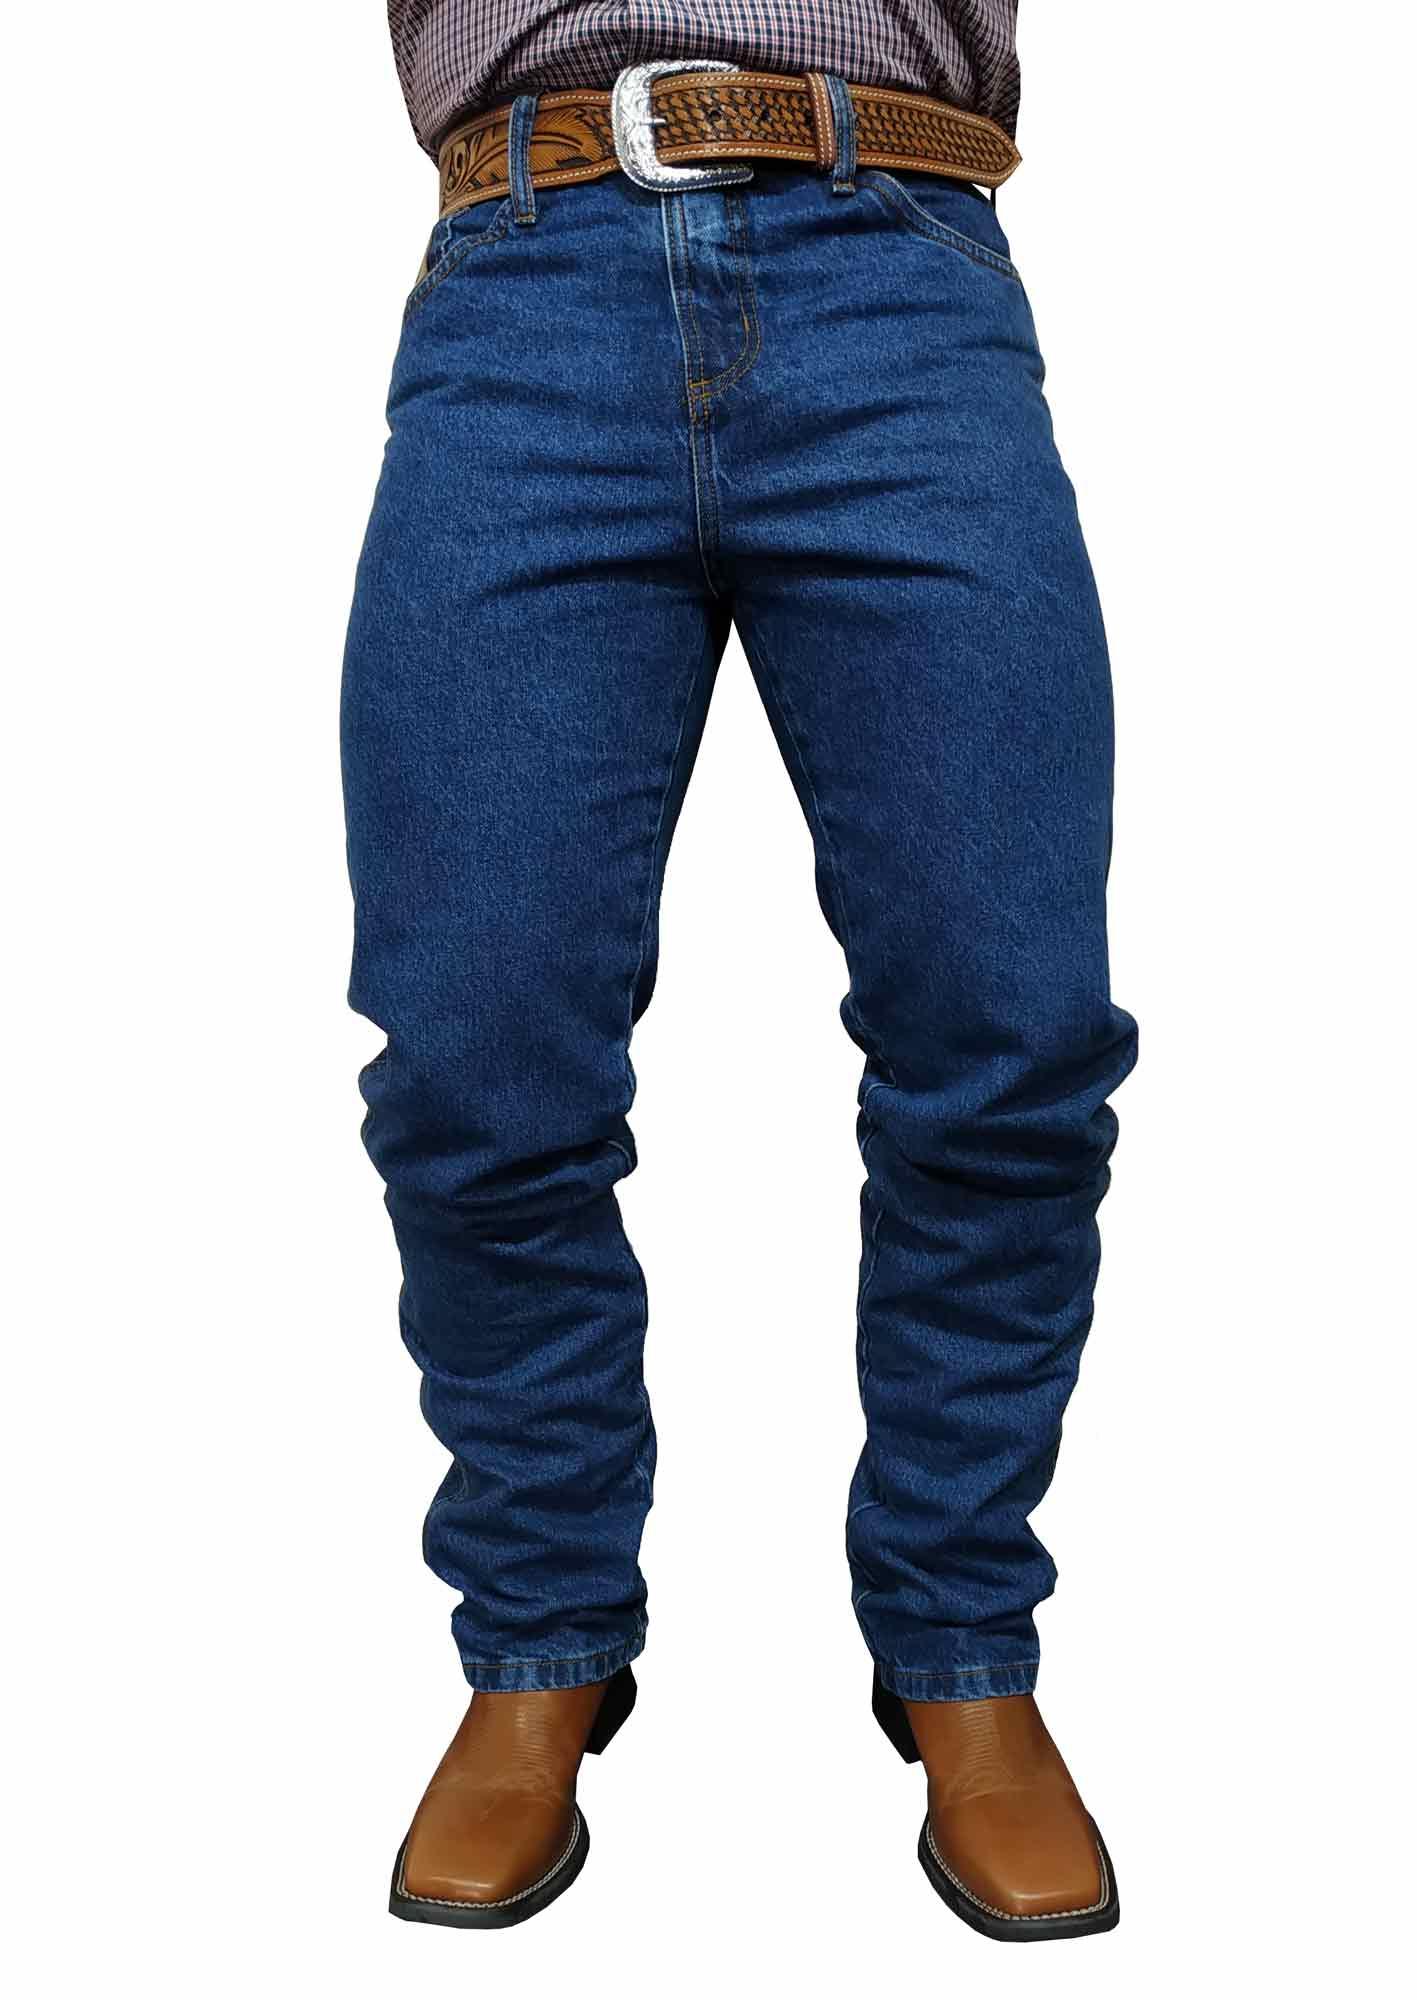 Calça Masculina Smith Brother's Amaciado Jeans Escuro Ref. B-146